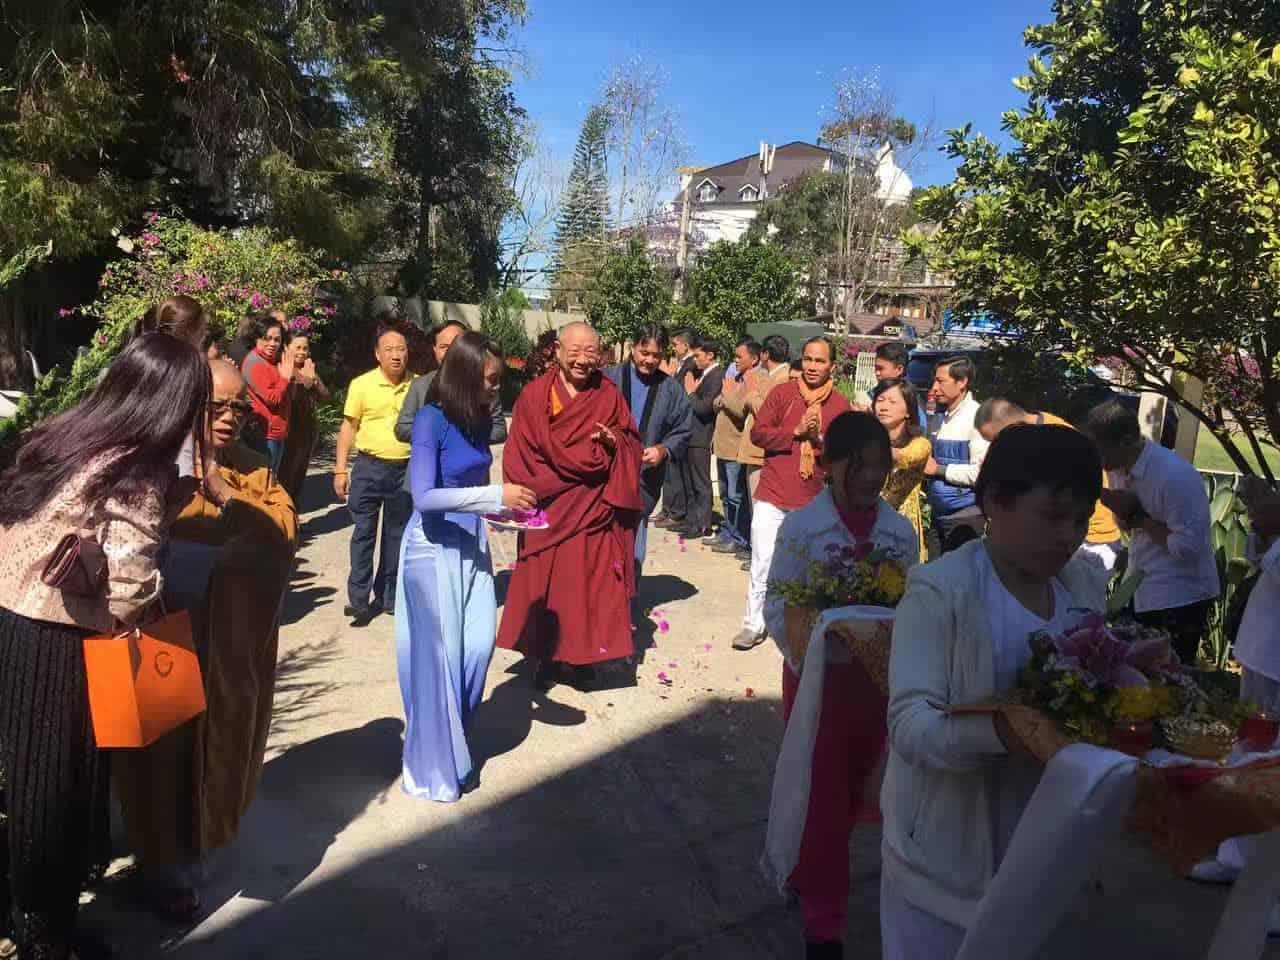 Gosok Rinpoche Vietnam 2017-03-07 efcd07d9ffcffb629029632555c3e19